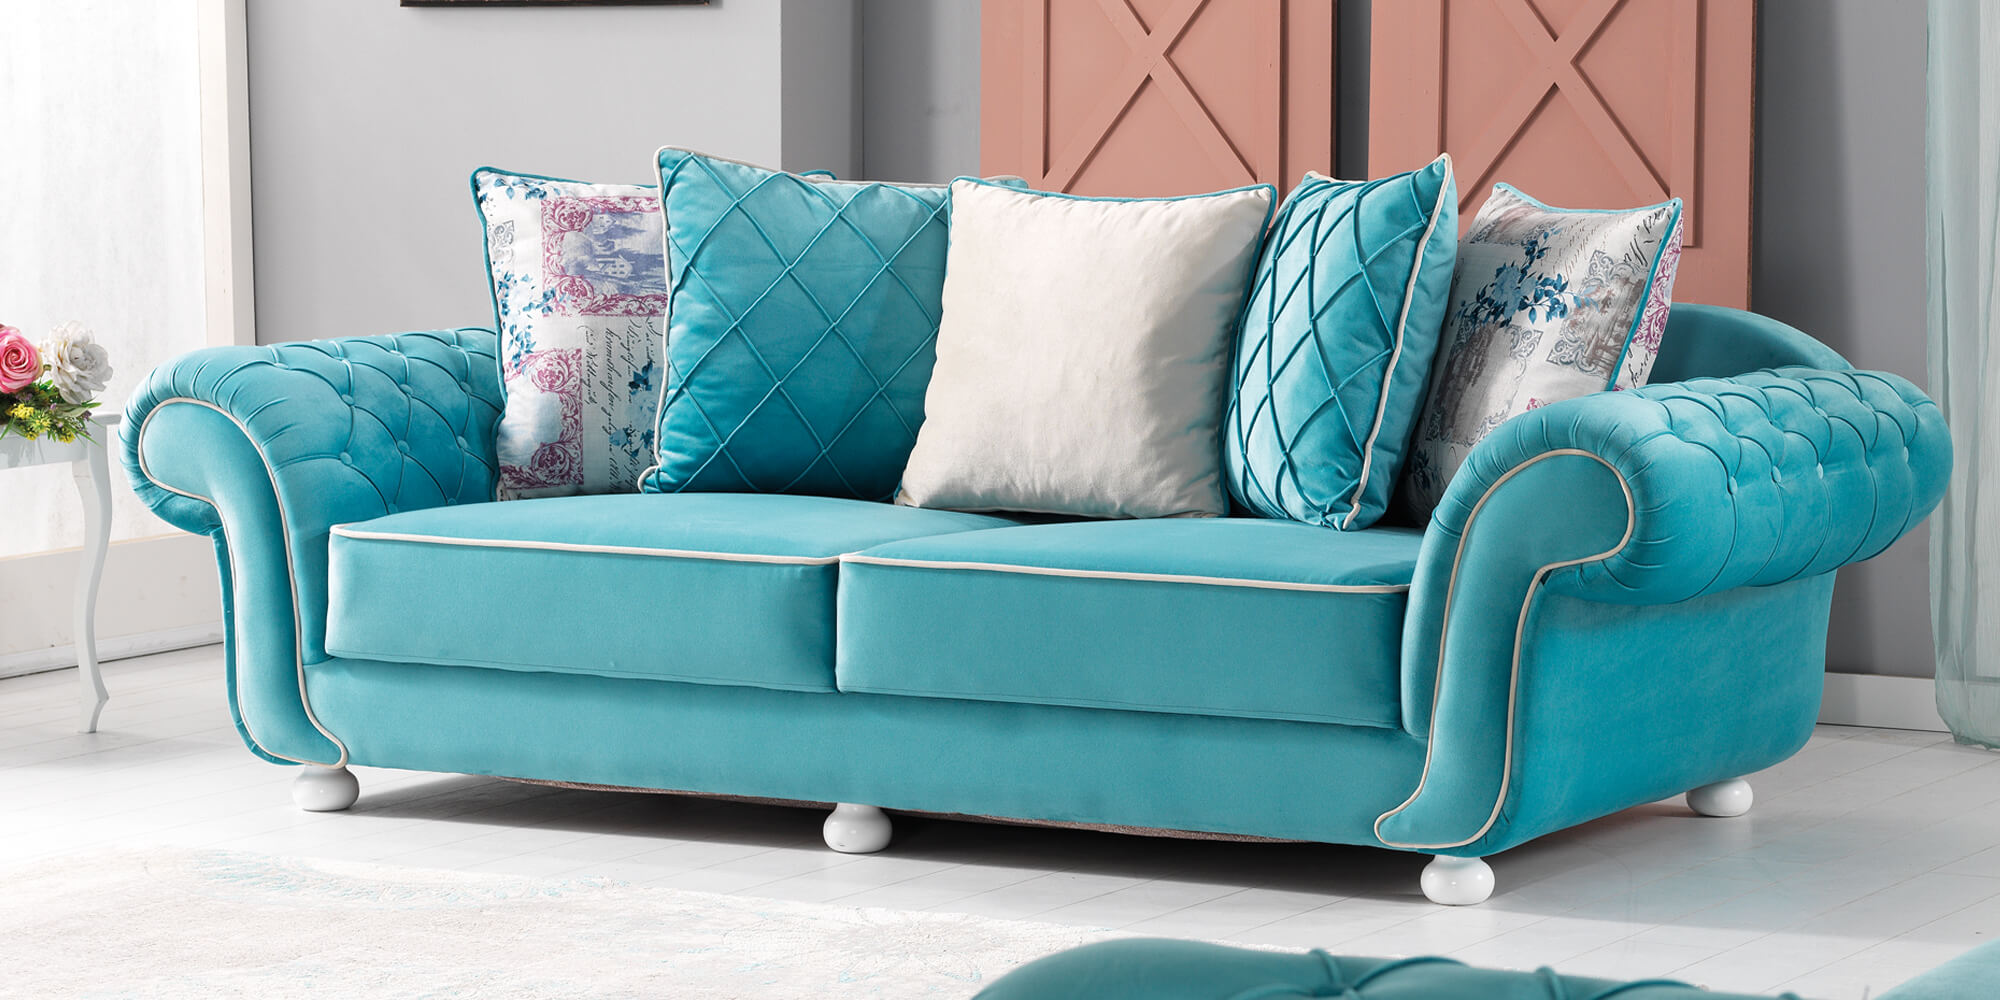 calikusu 3 2 1 sofa set yuvam m belhaus in wuppertal cilek offizieller h ndler in europa. Black Bedroom Furniture Sets. Home Design Ideas